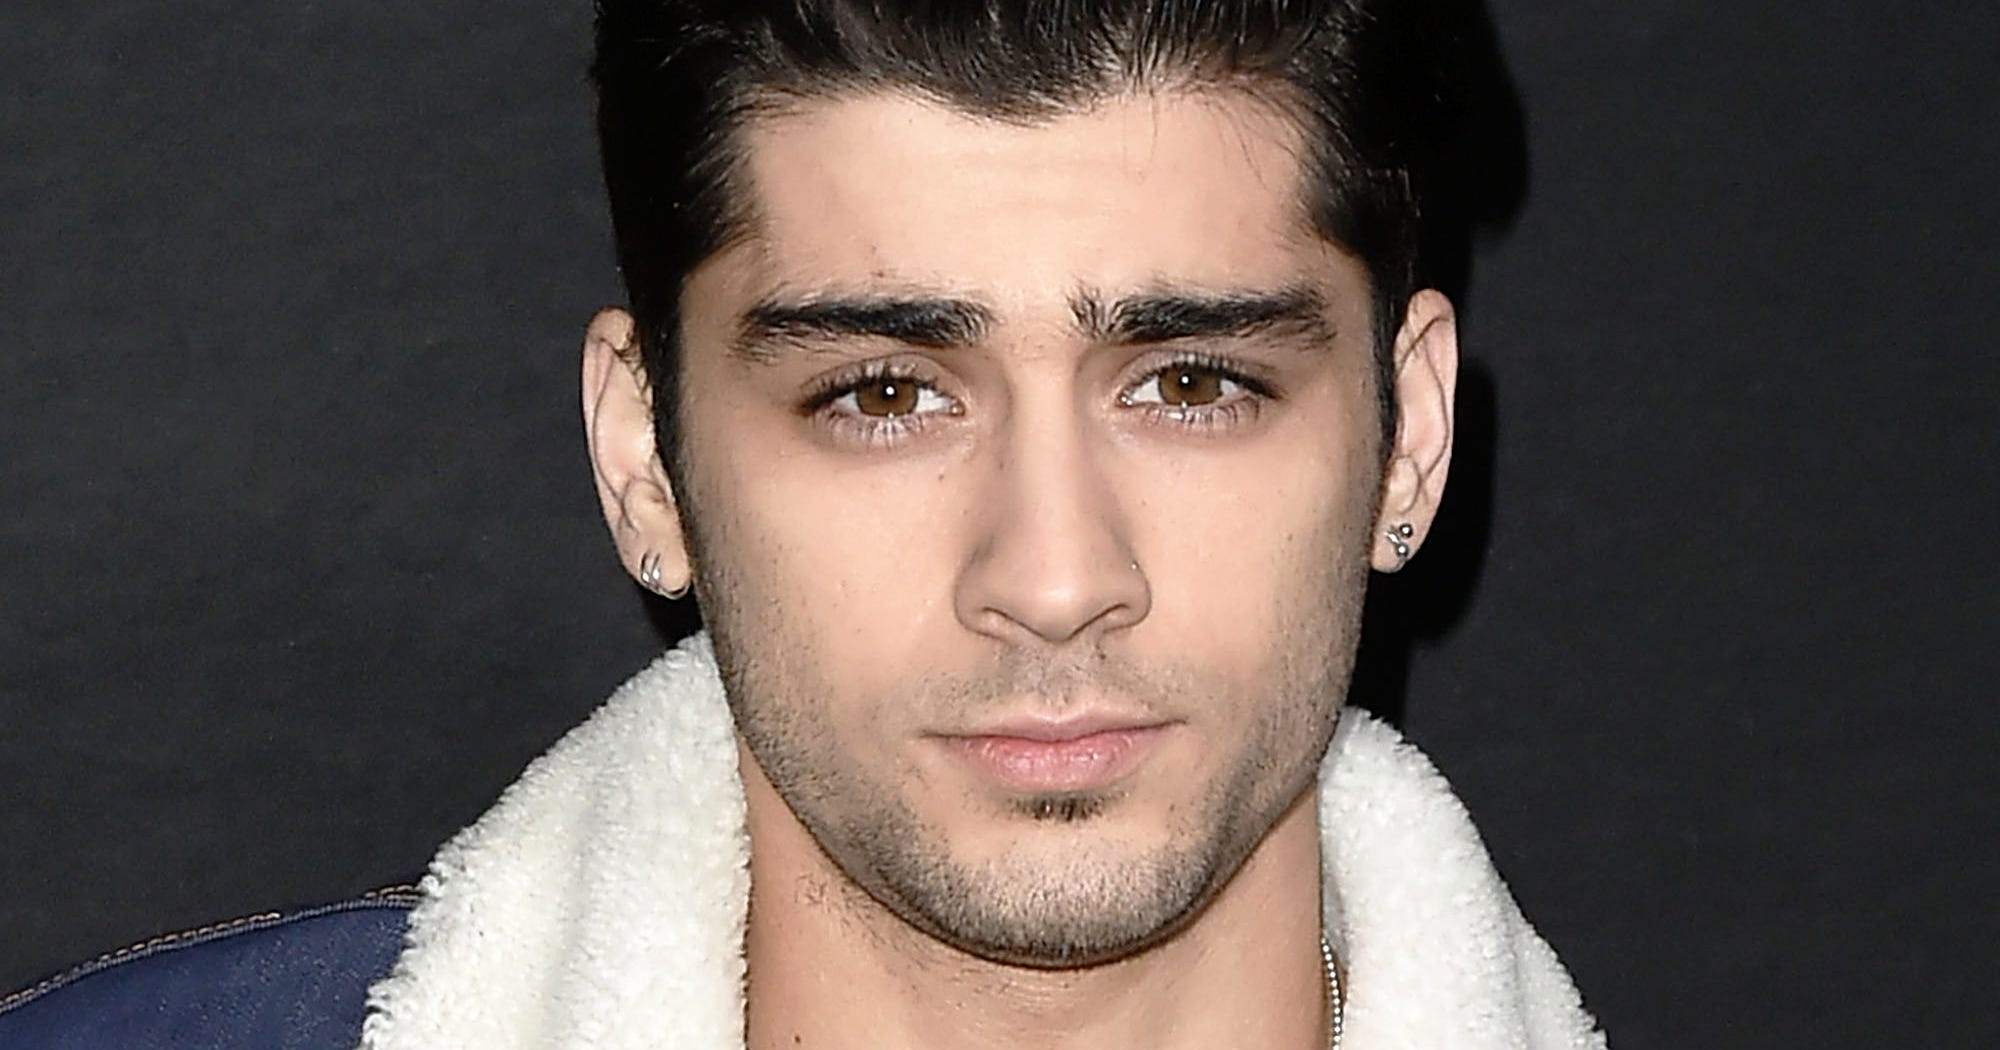 Zayn Malik New Long Hair Man Bangs Hairstyle Photo